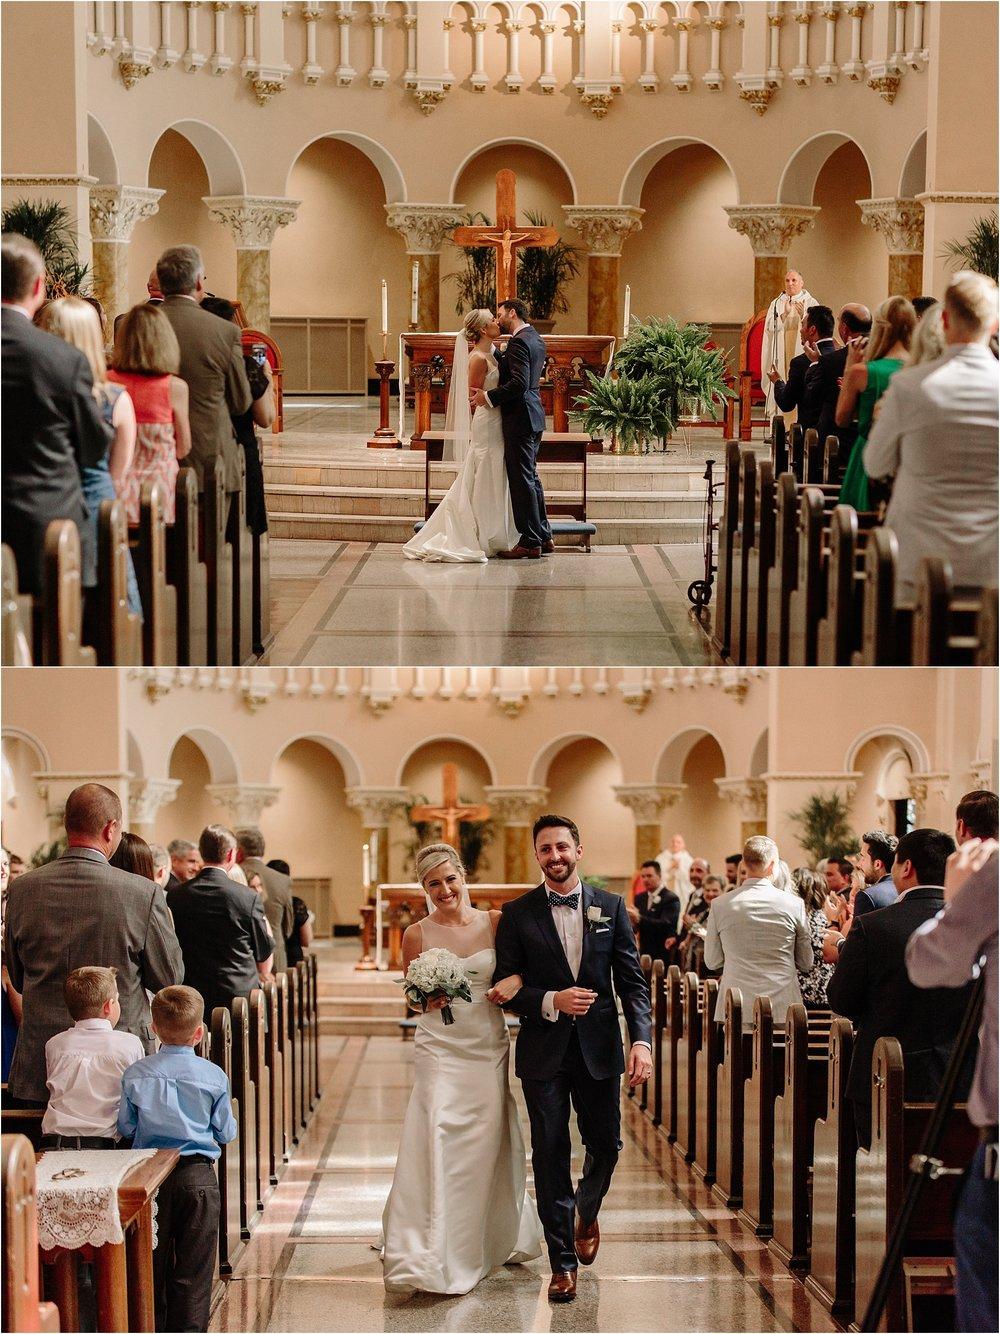 chicago-wedding-photographer-109.jpg